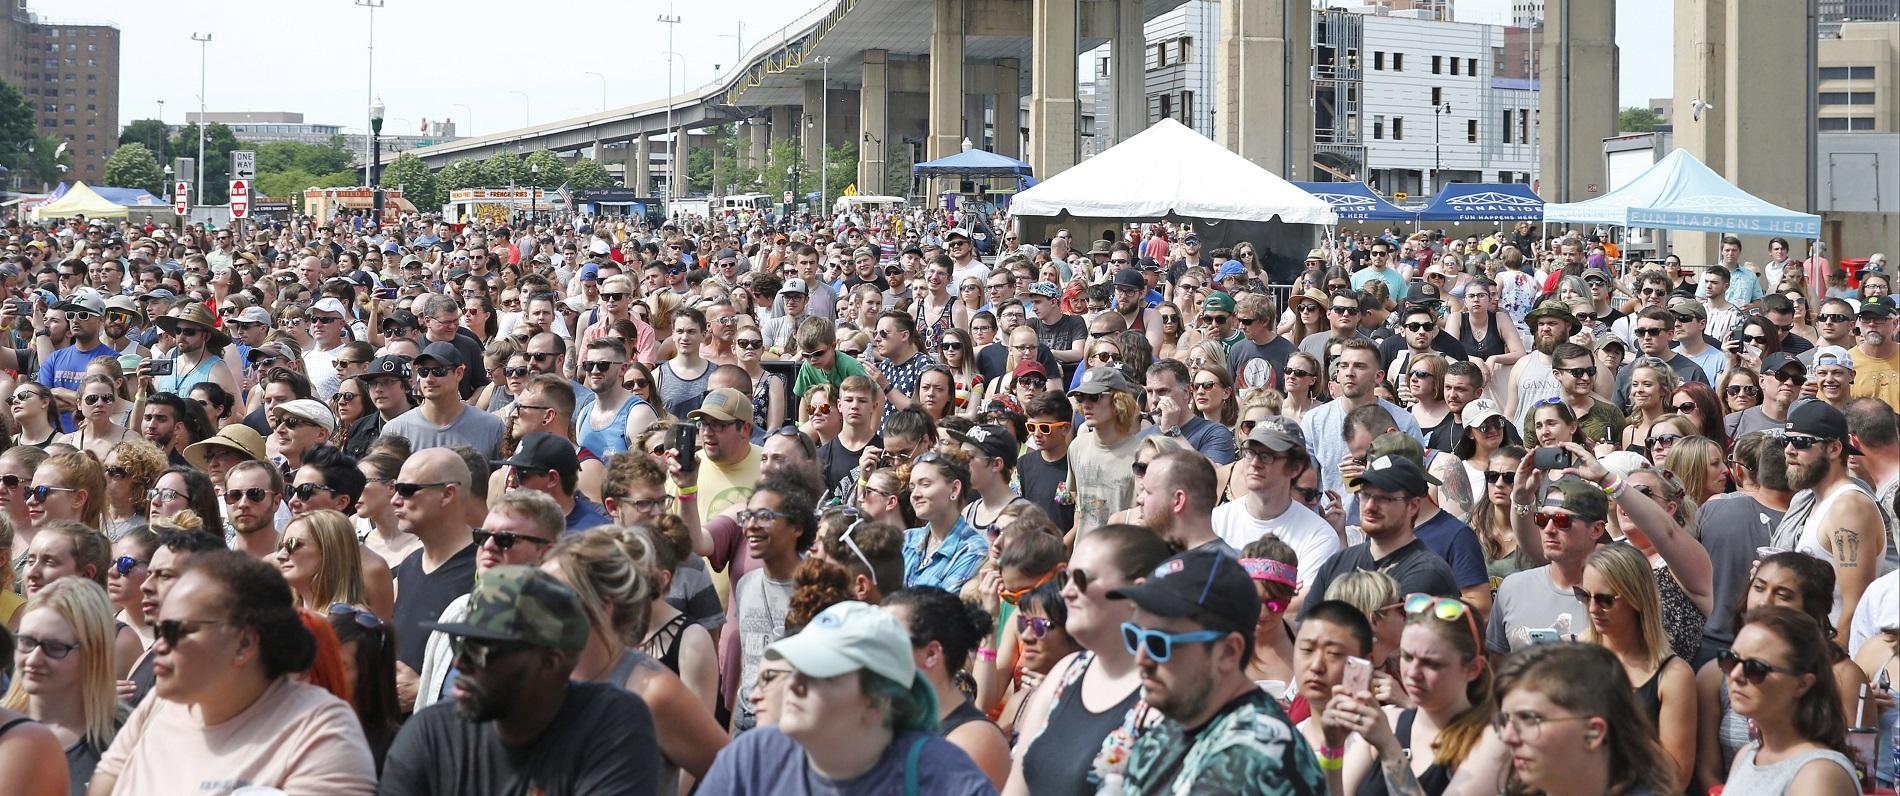 Canalside was again a popular spot to see a concert in 2018. (Robert Kirkham/Buffalo News)